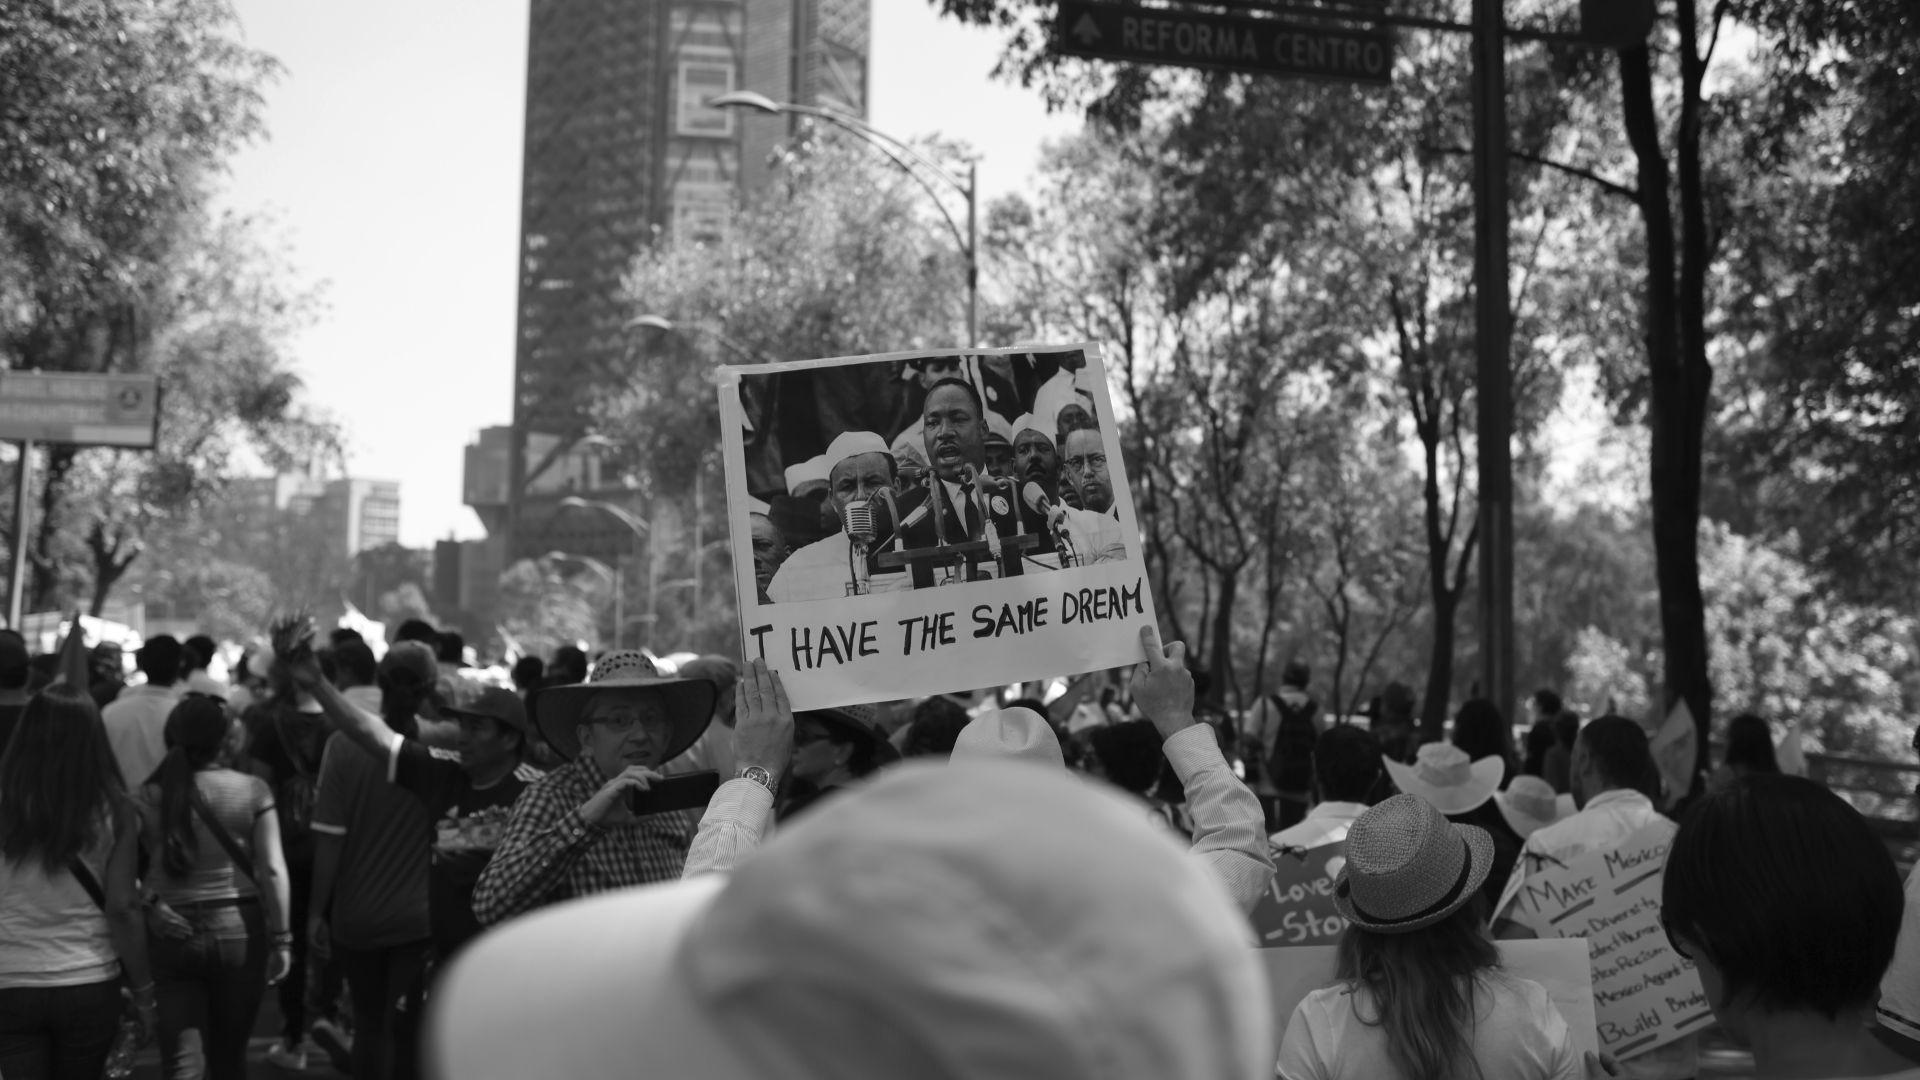 I have the same dream. Photo credit: Jerónimo Bernot on Unsplash.